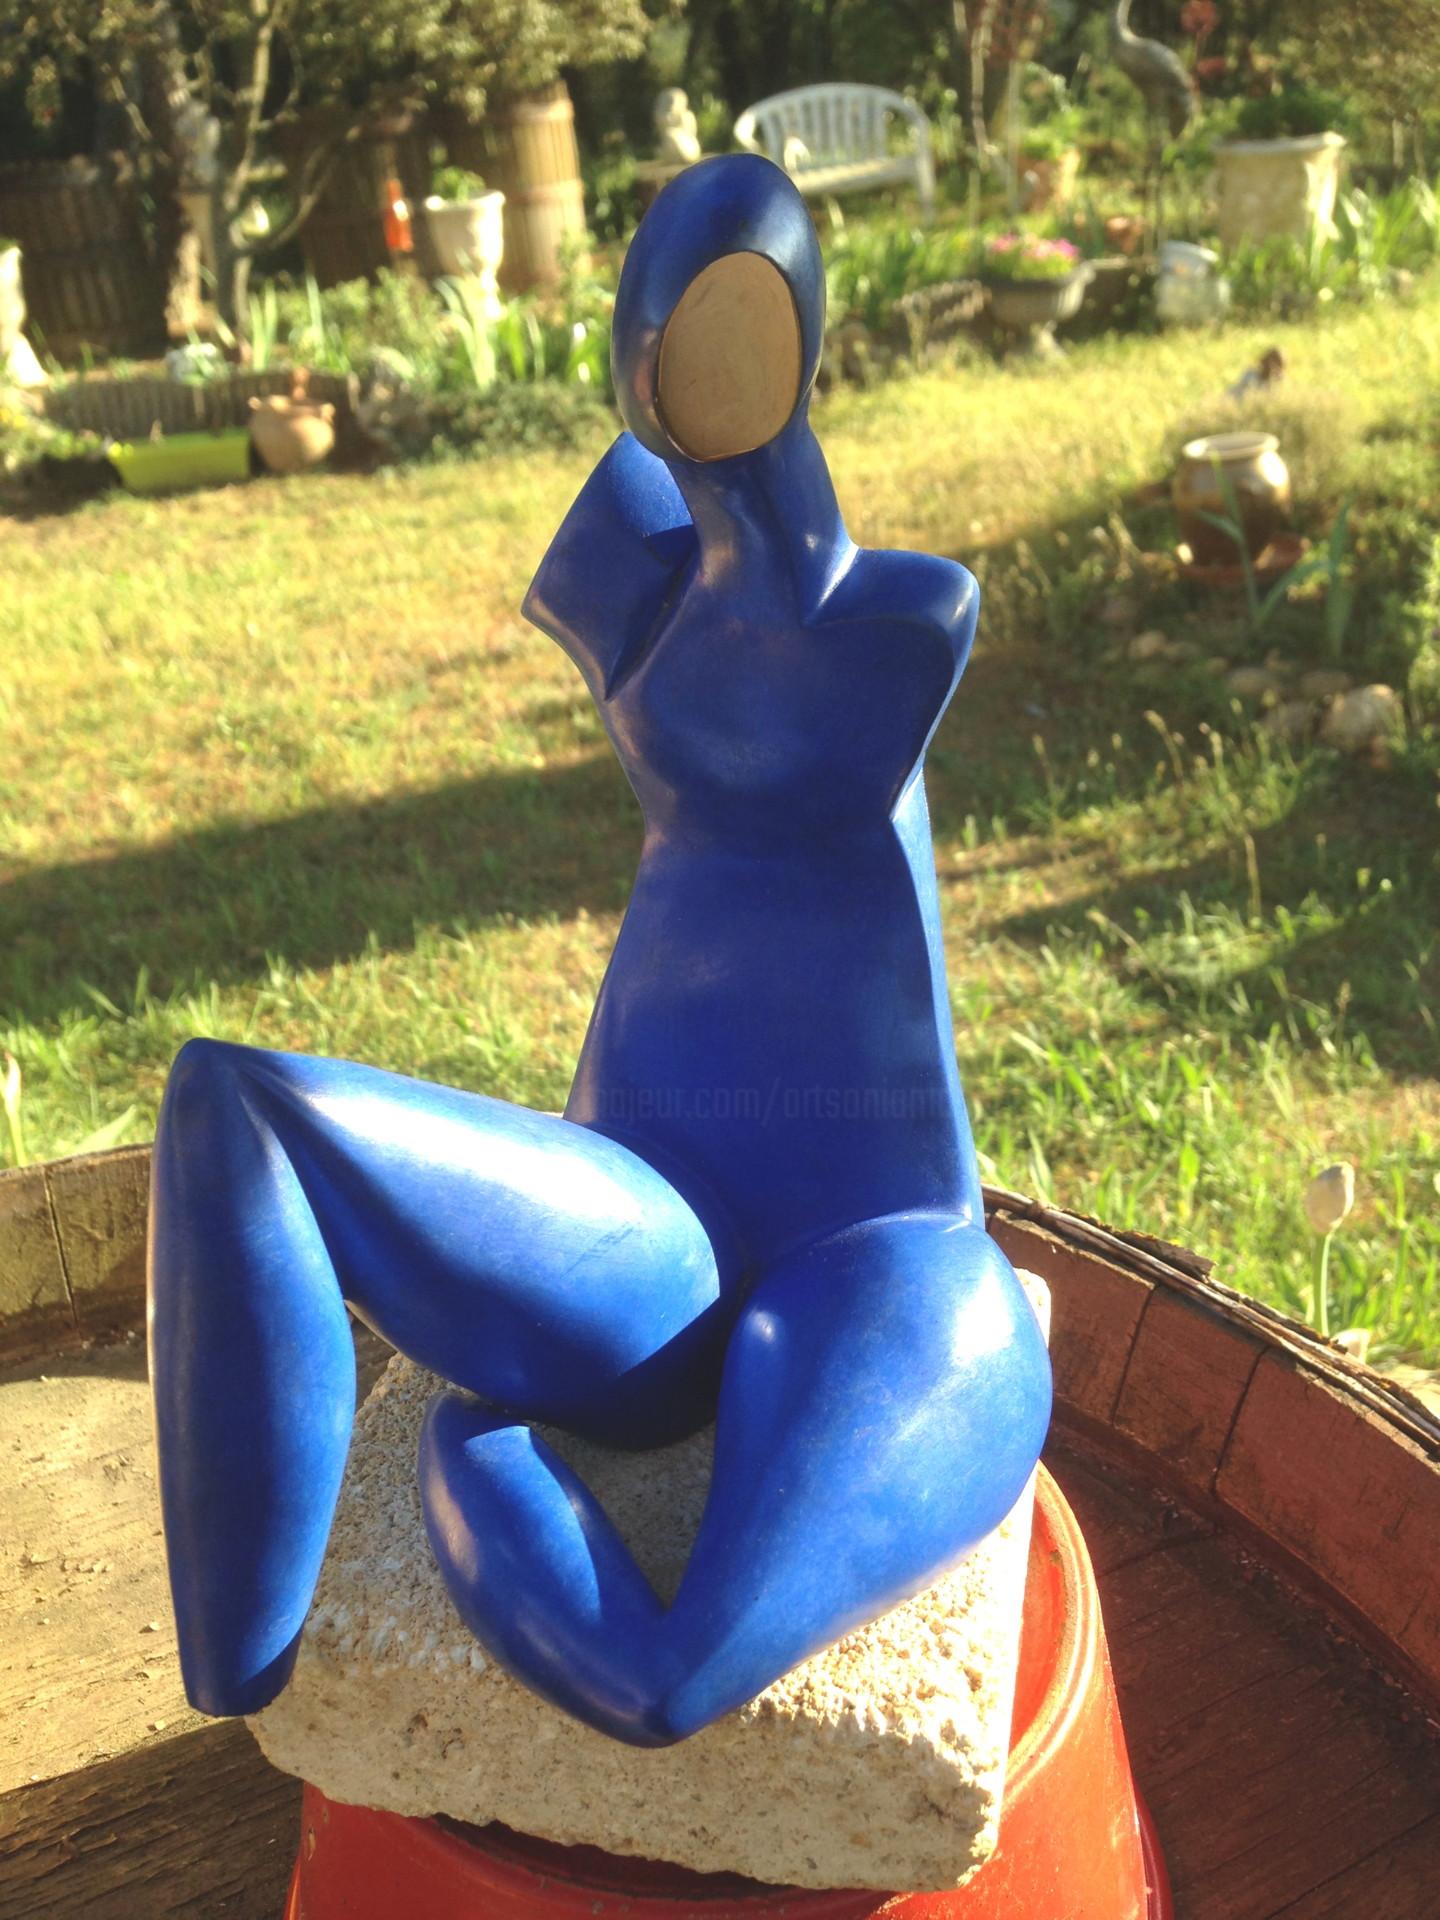 Mandel Sonia - TIFFANY Bronze bleu électric et poli